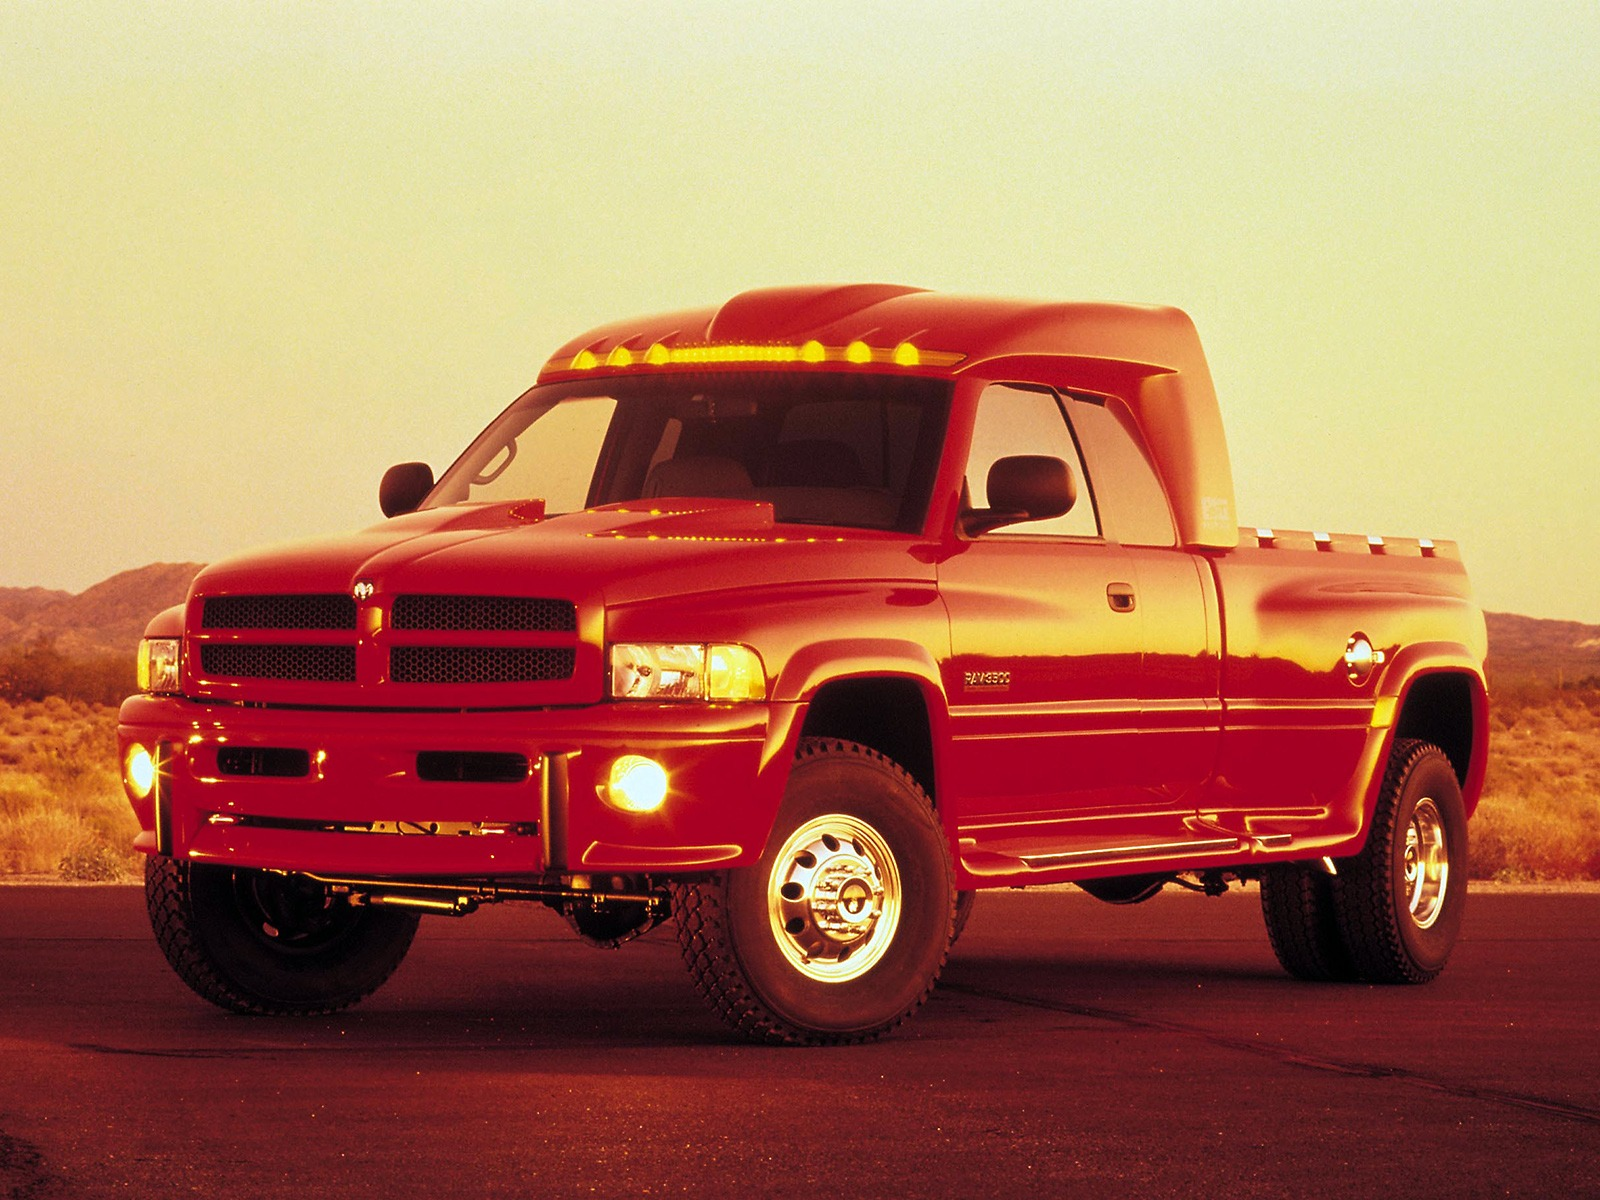 Dodge big red truck concept 2 98concept dodge big red truck concept 4